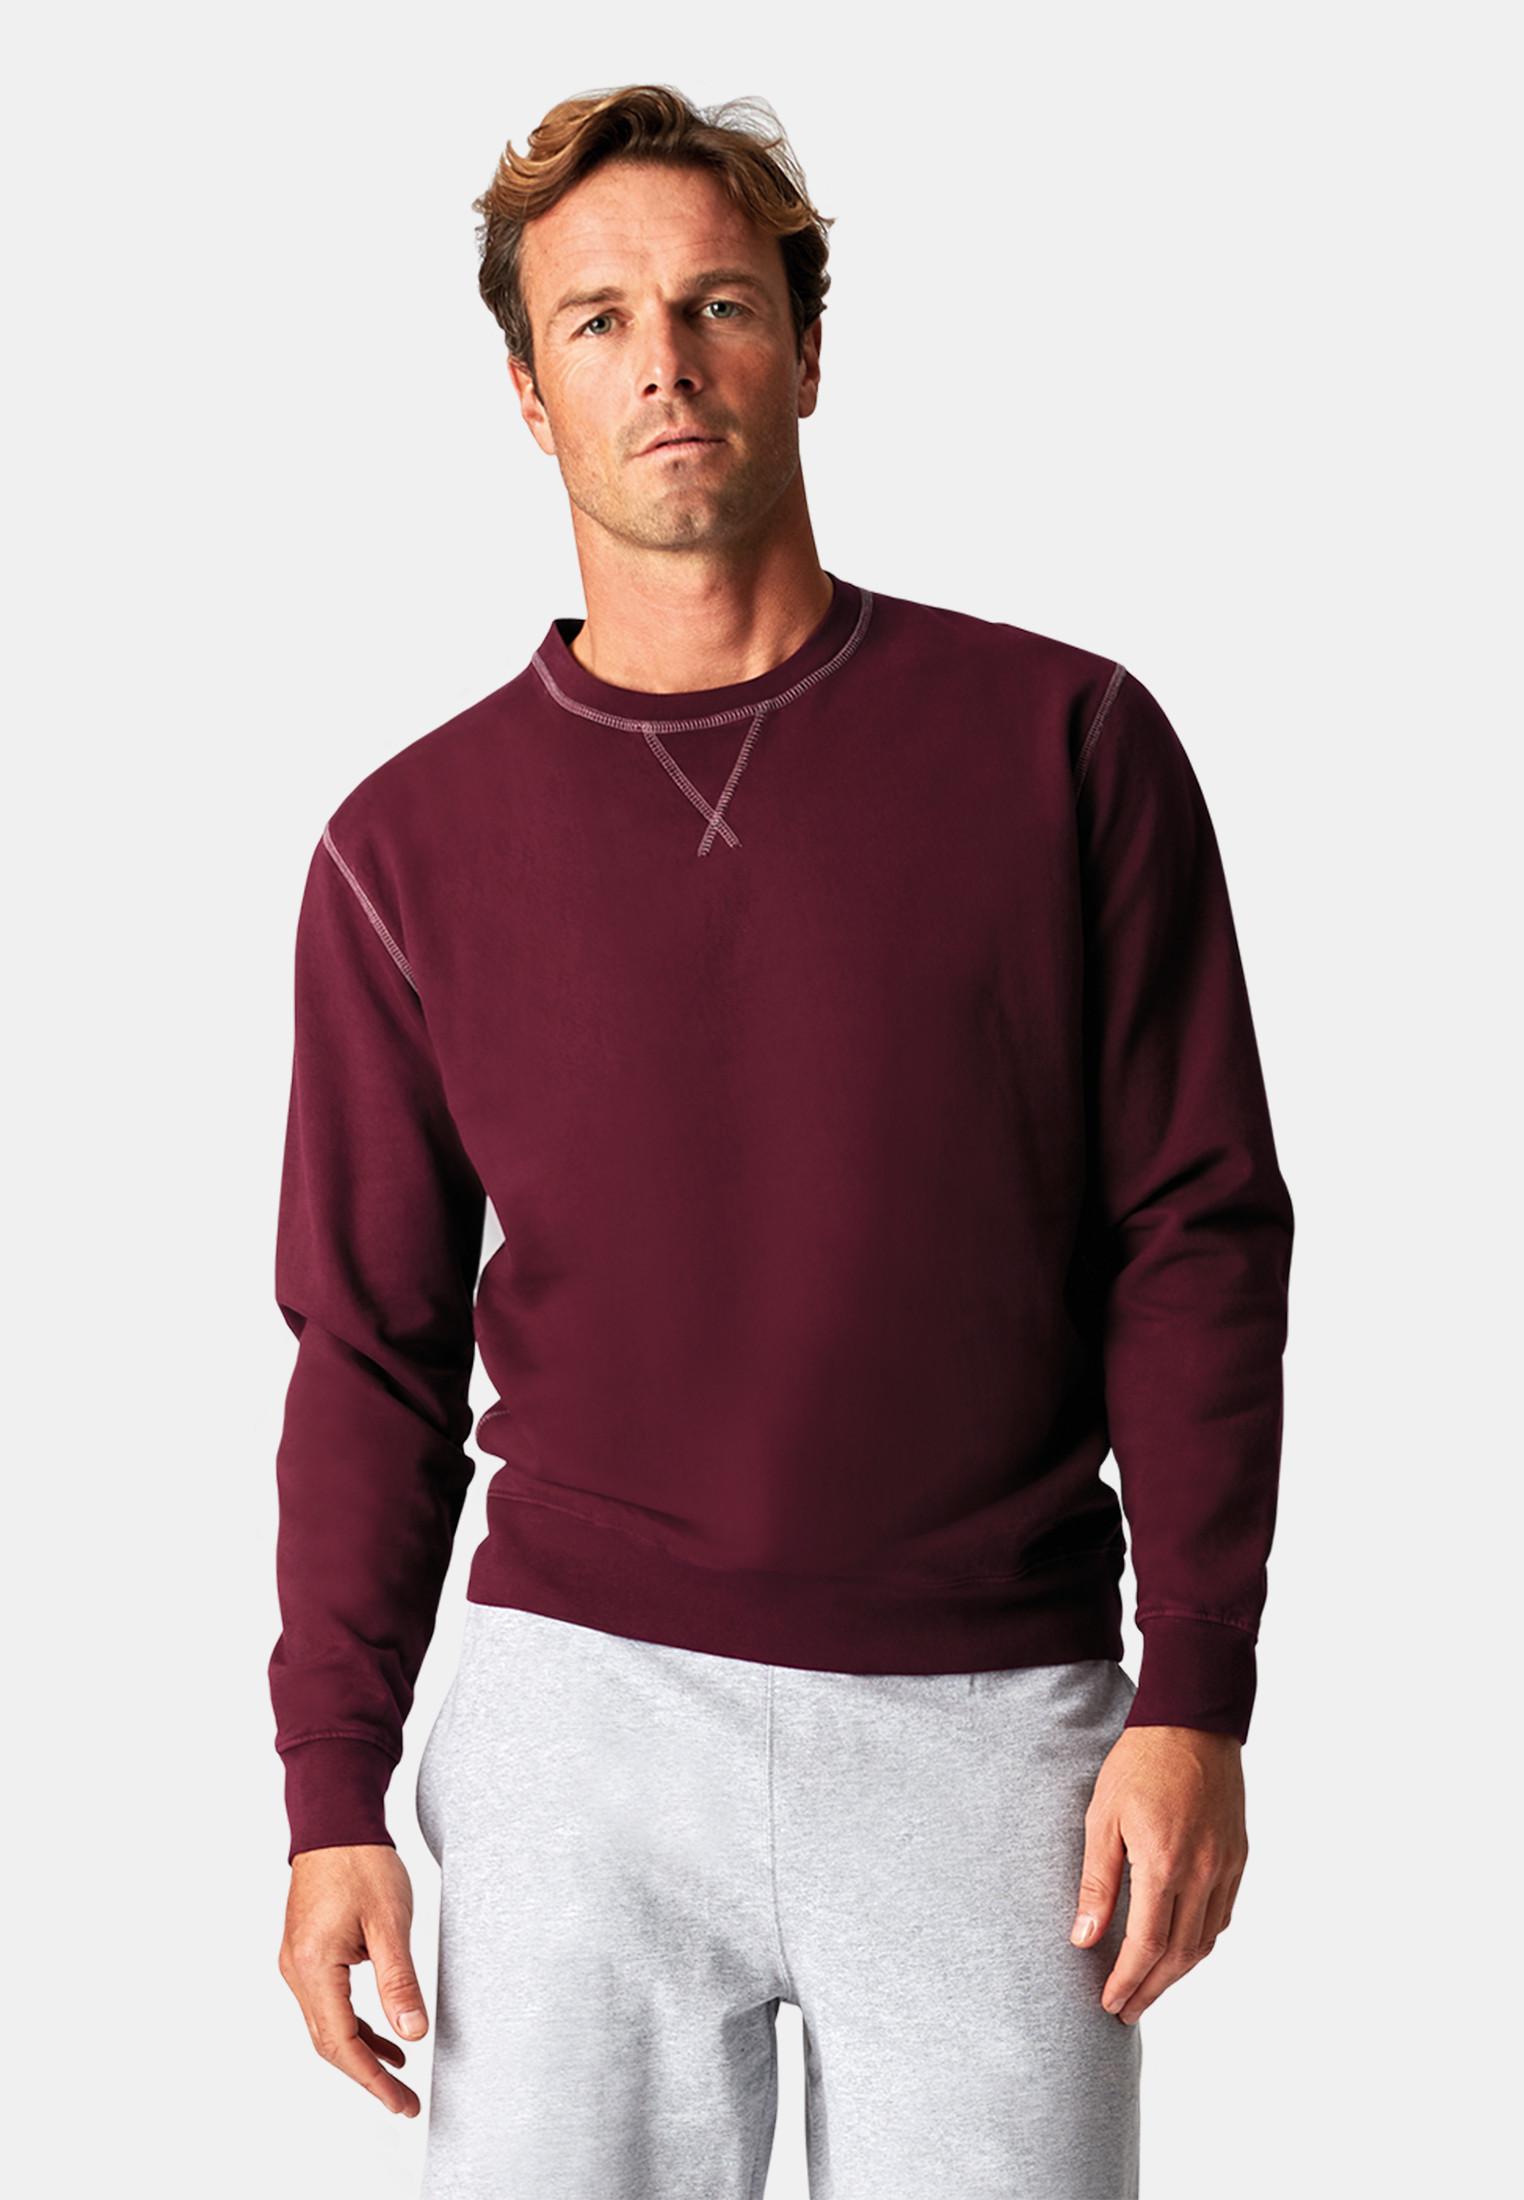 London Wine Garment Washed Crew Neck Sweatshirt